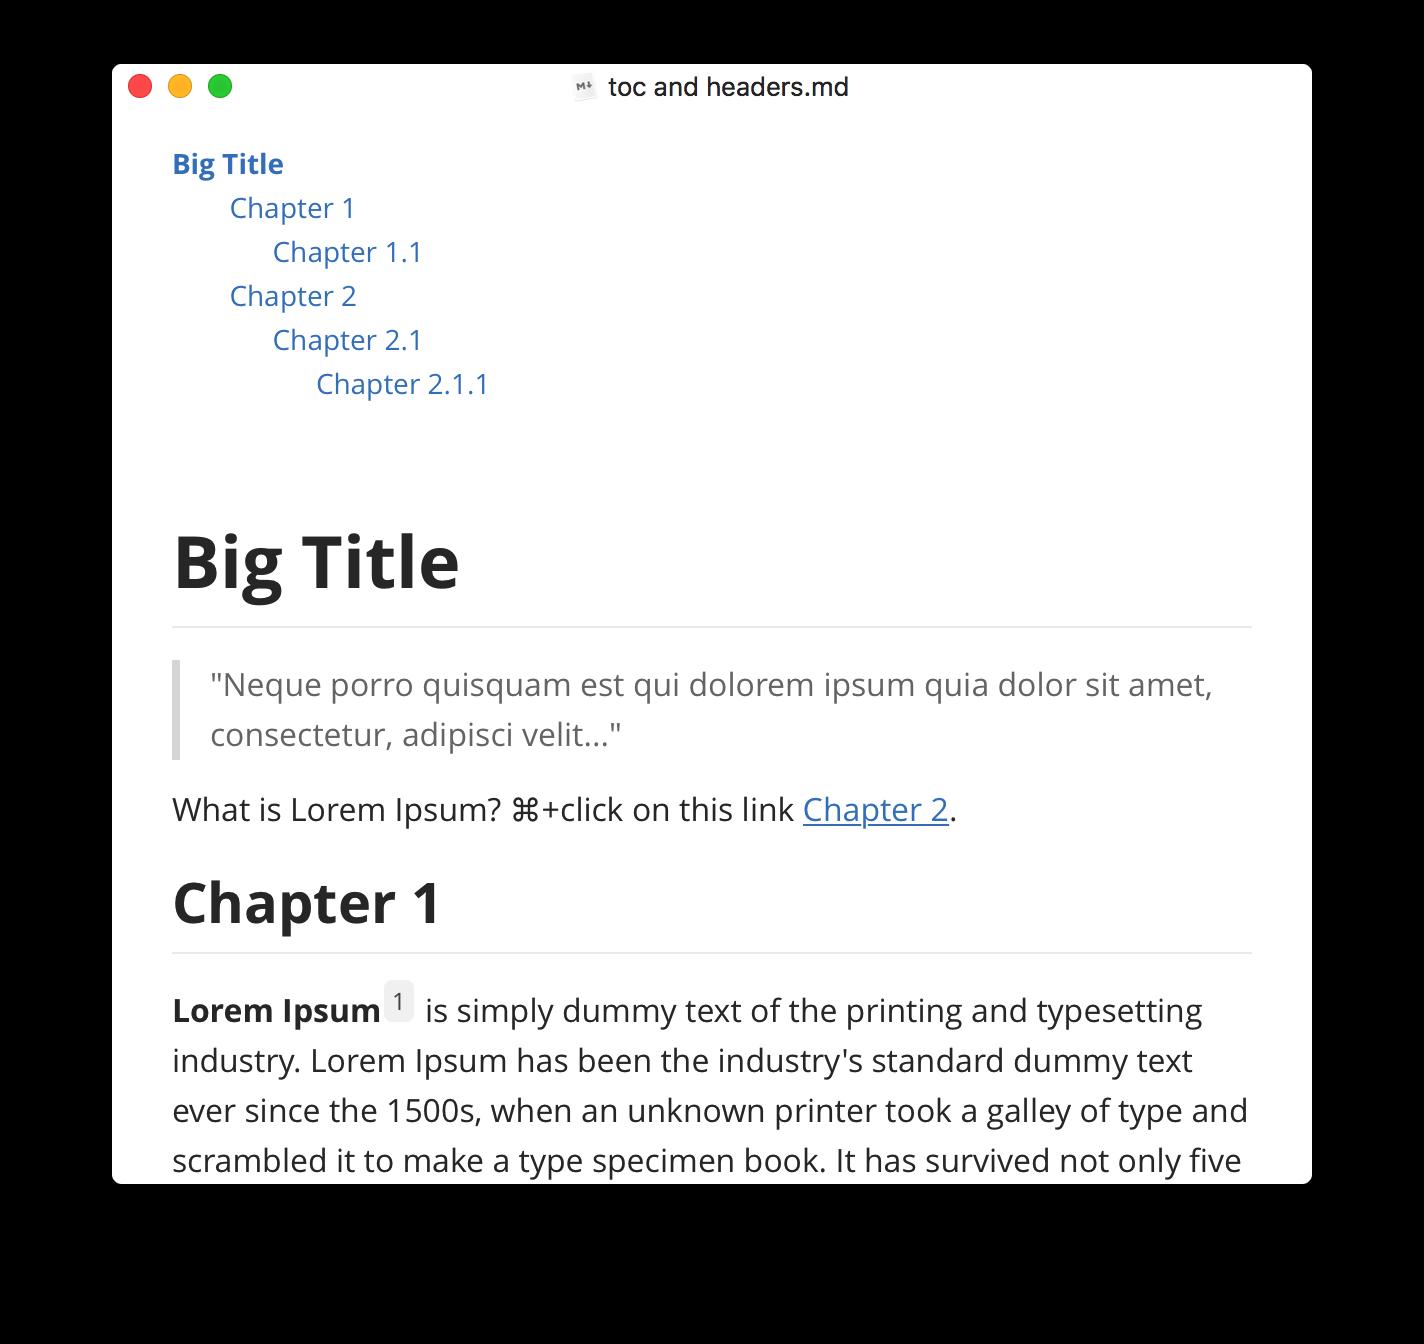 Typora写作更简单,免费极简编辑器